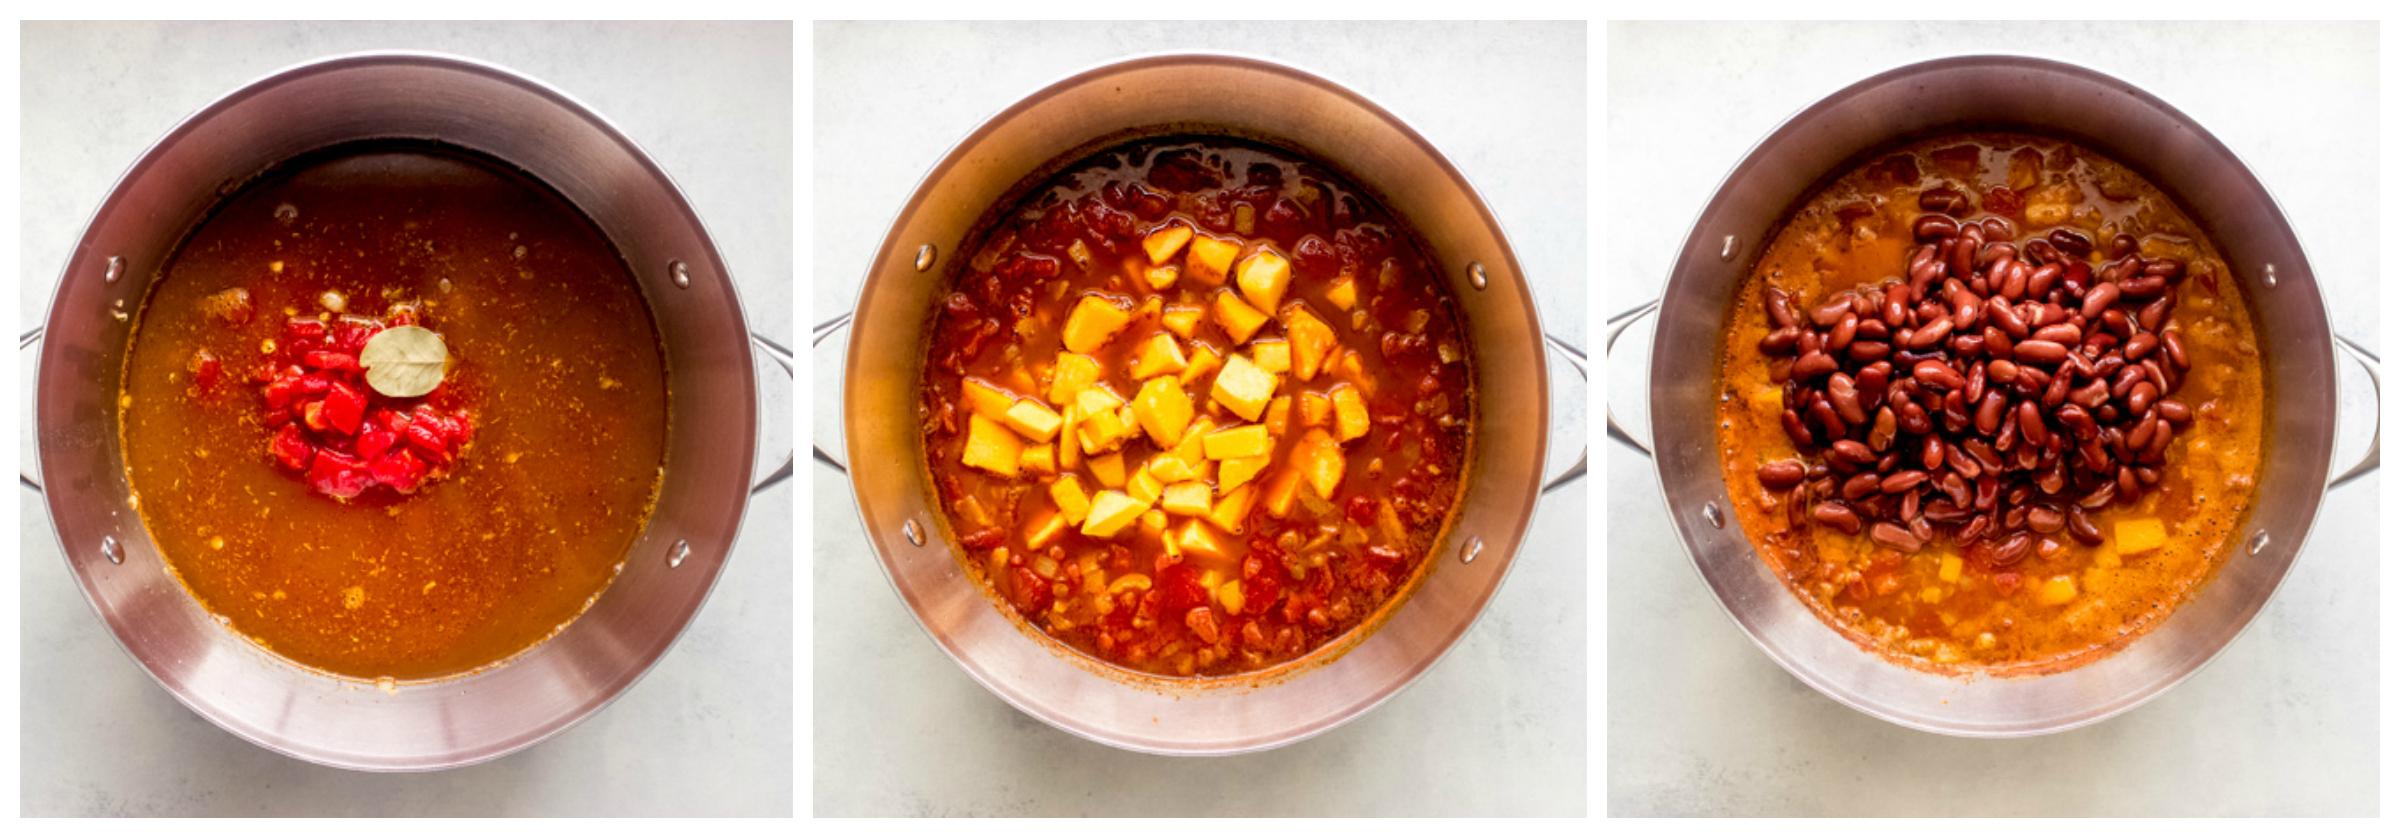 lentil chili with butternut squash in a dutch oven